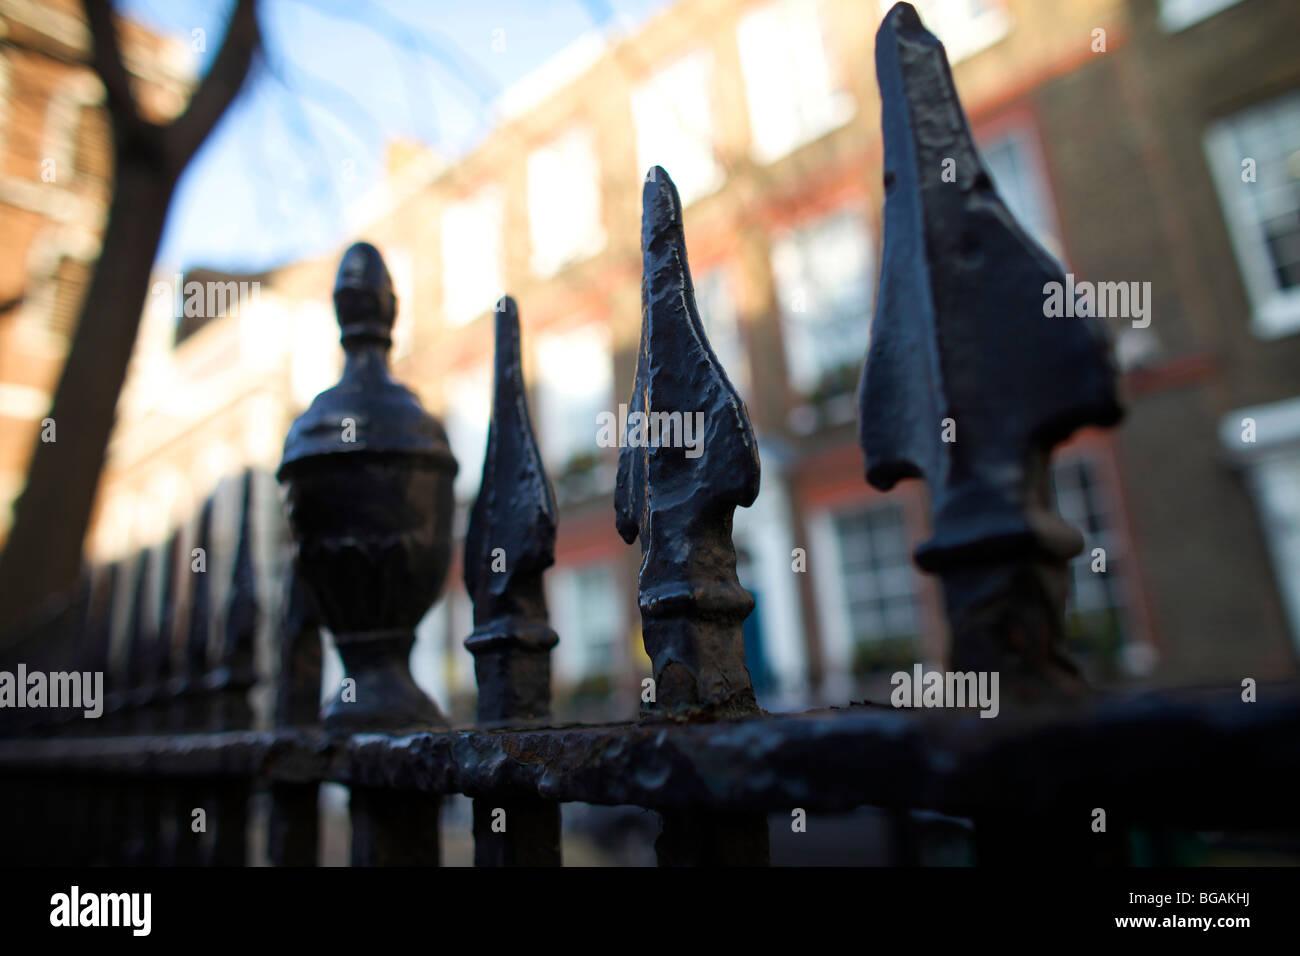 Cast Iron Railings in London UK - Stock Image